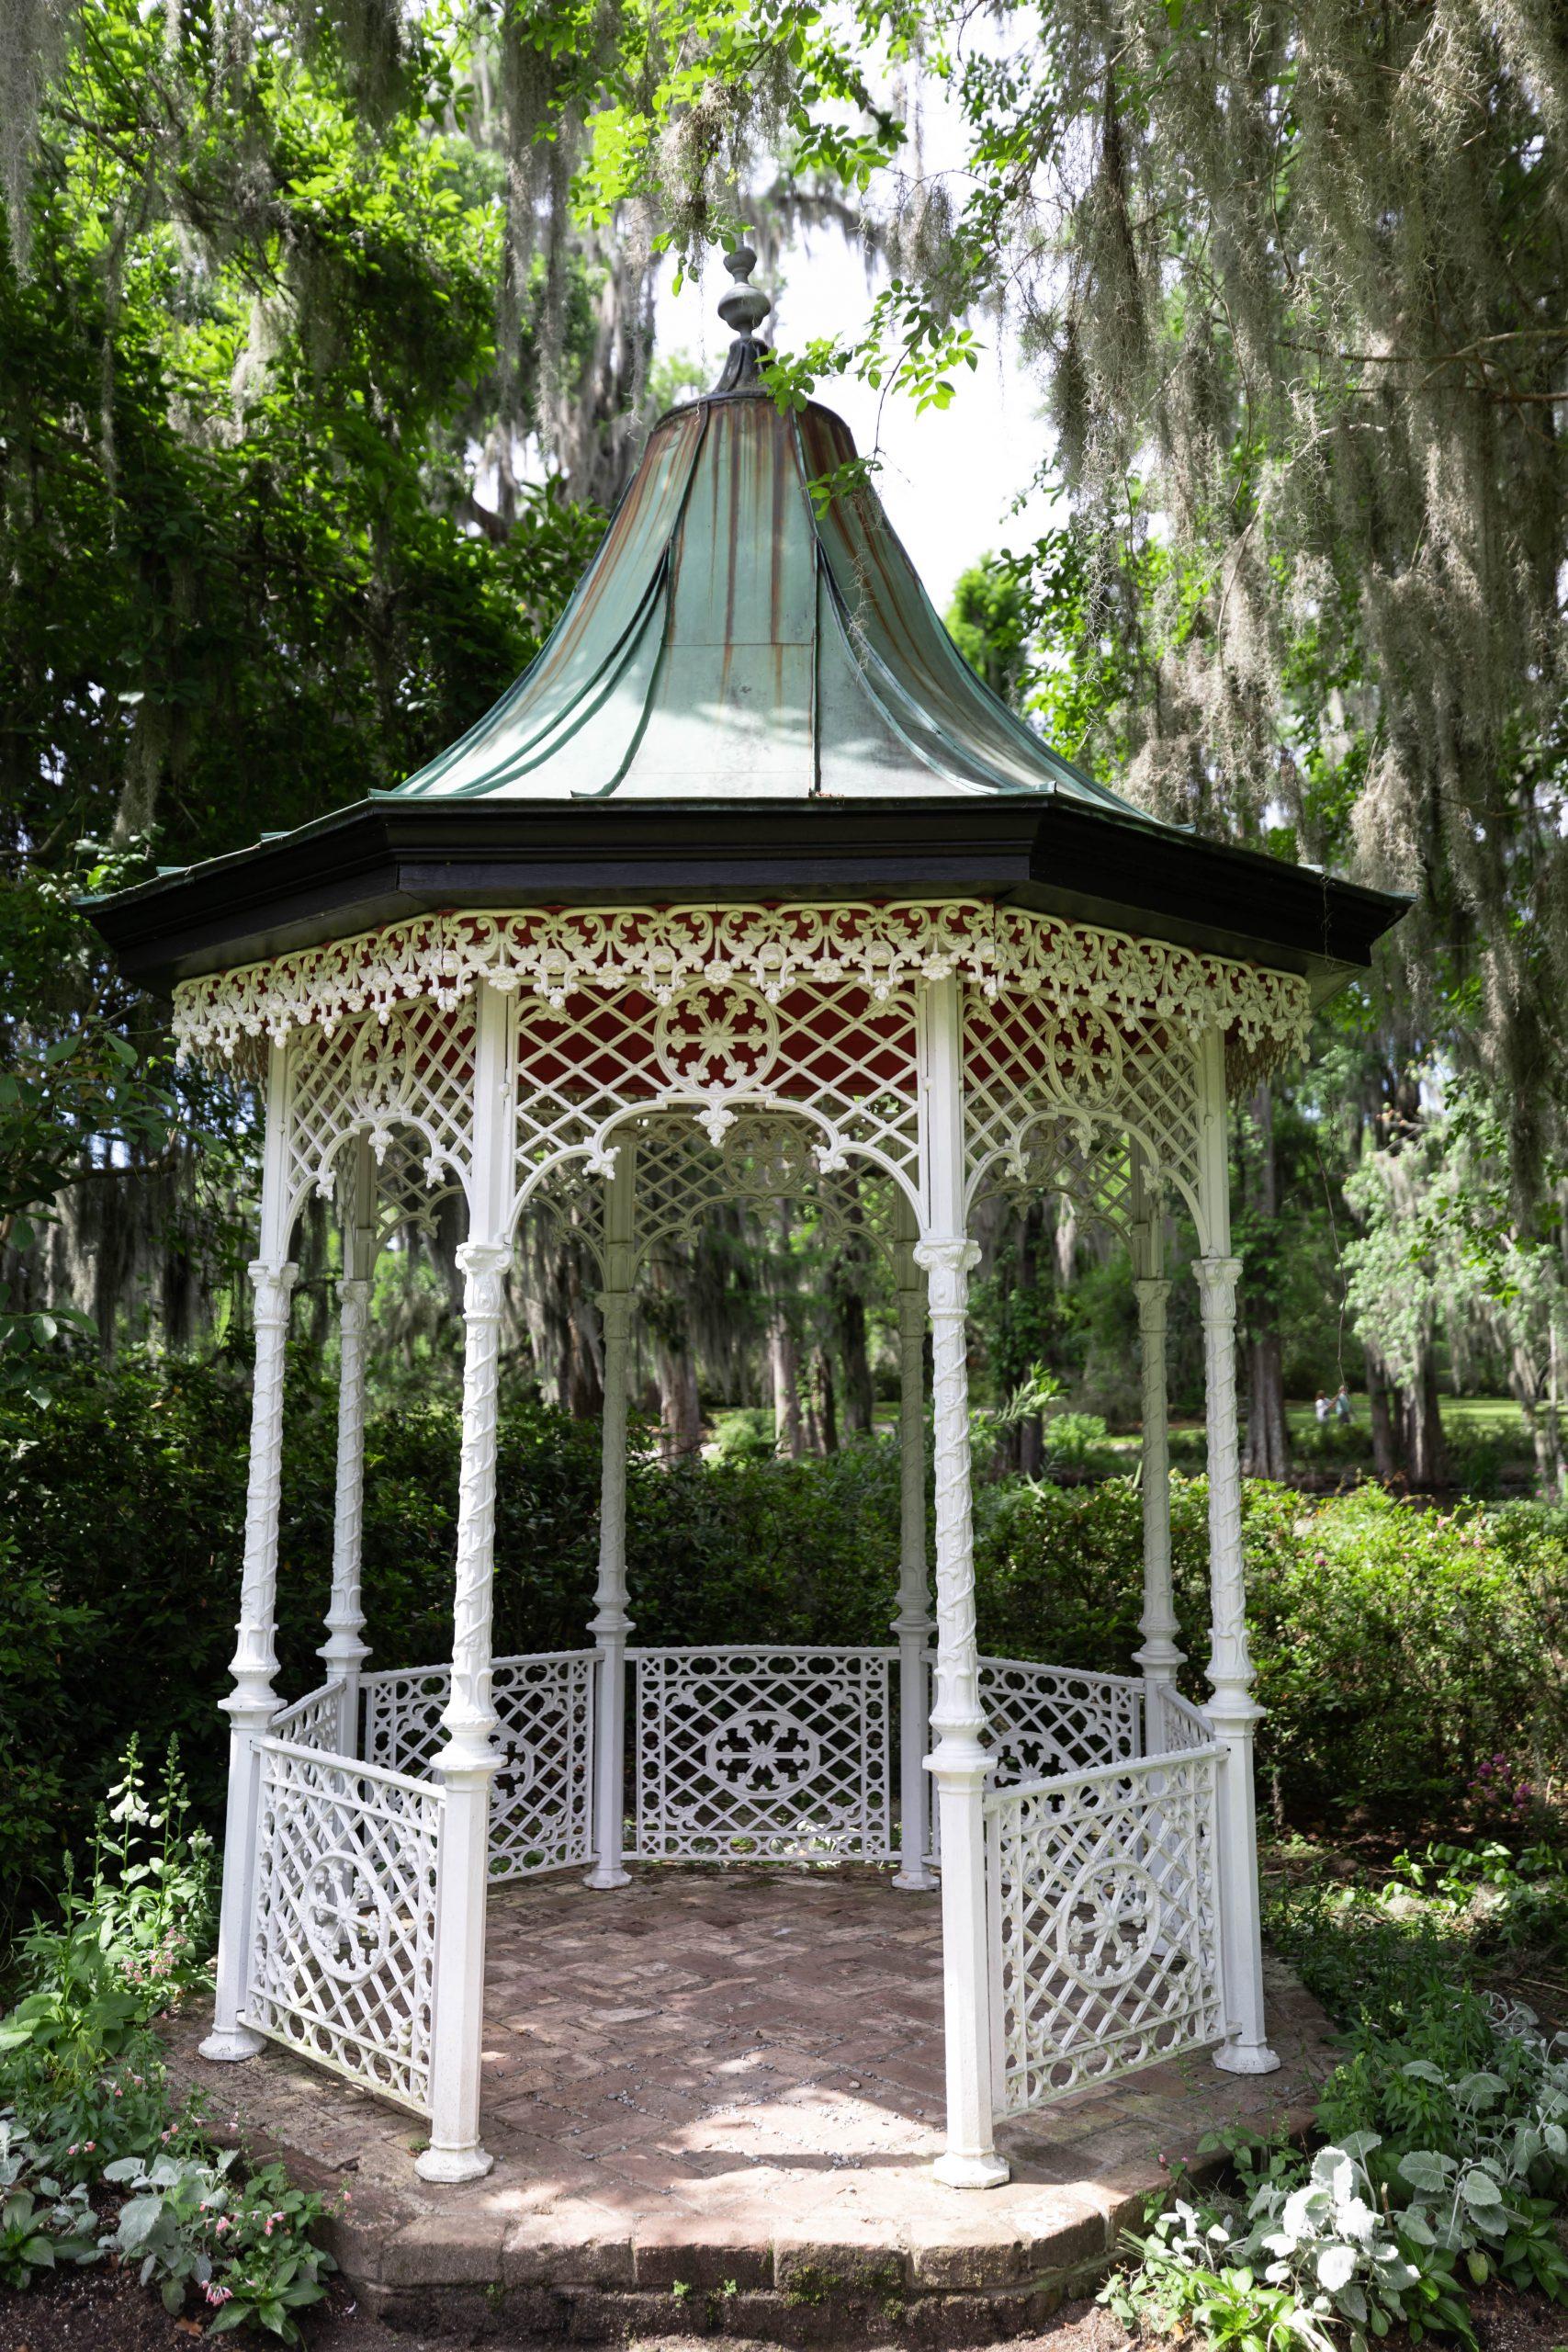 Gazebo at Magnolia Plantation & Gardens Written & Photographed by Annie Fairfax